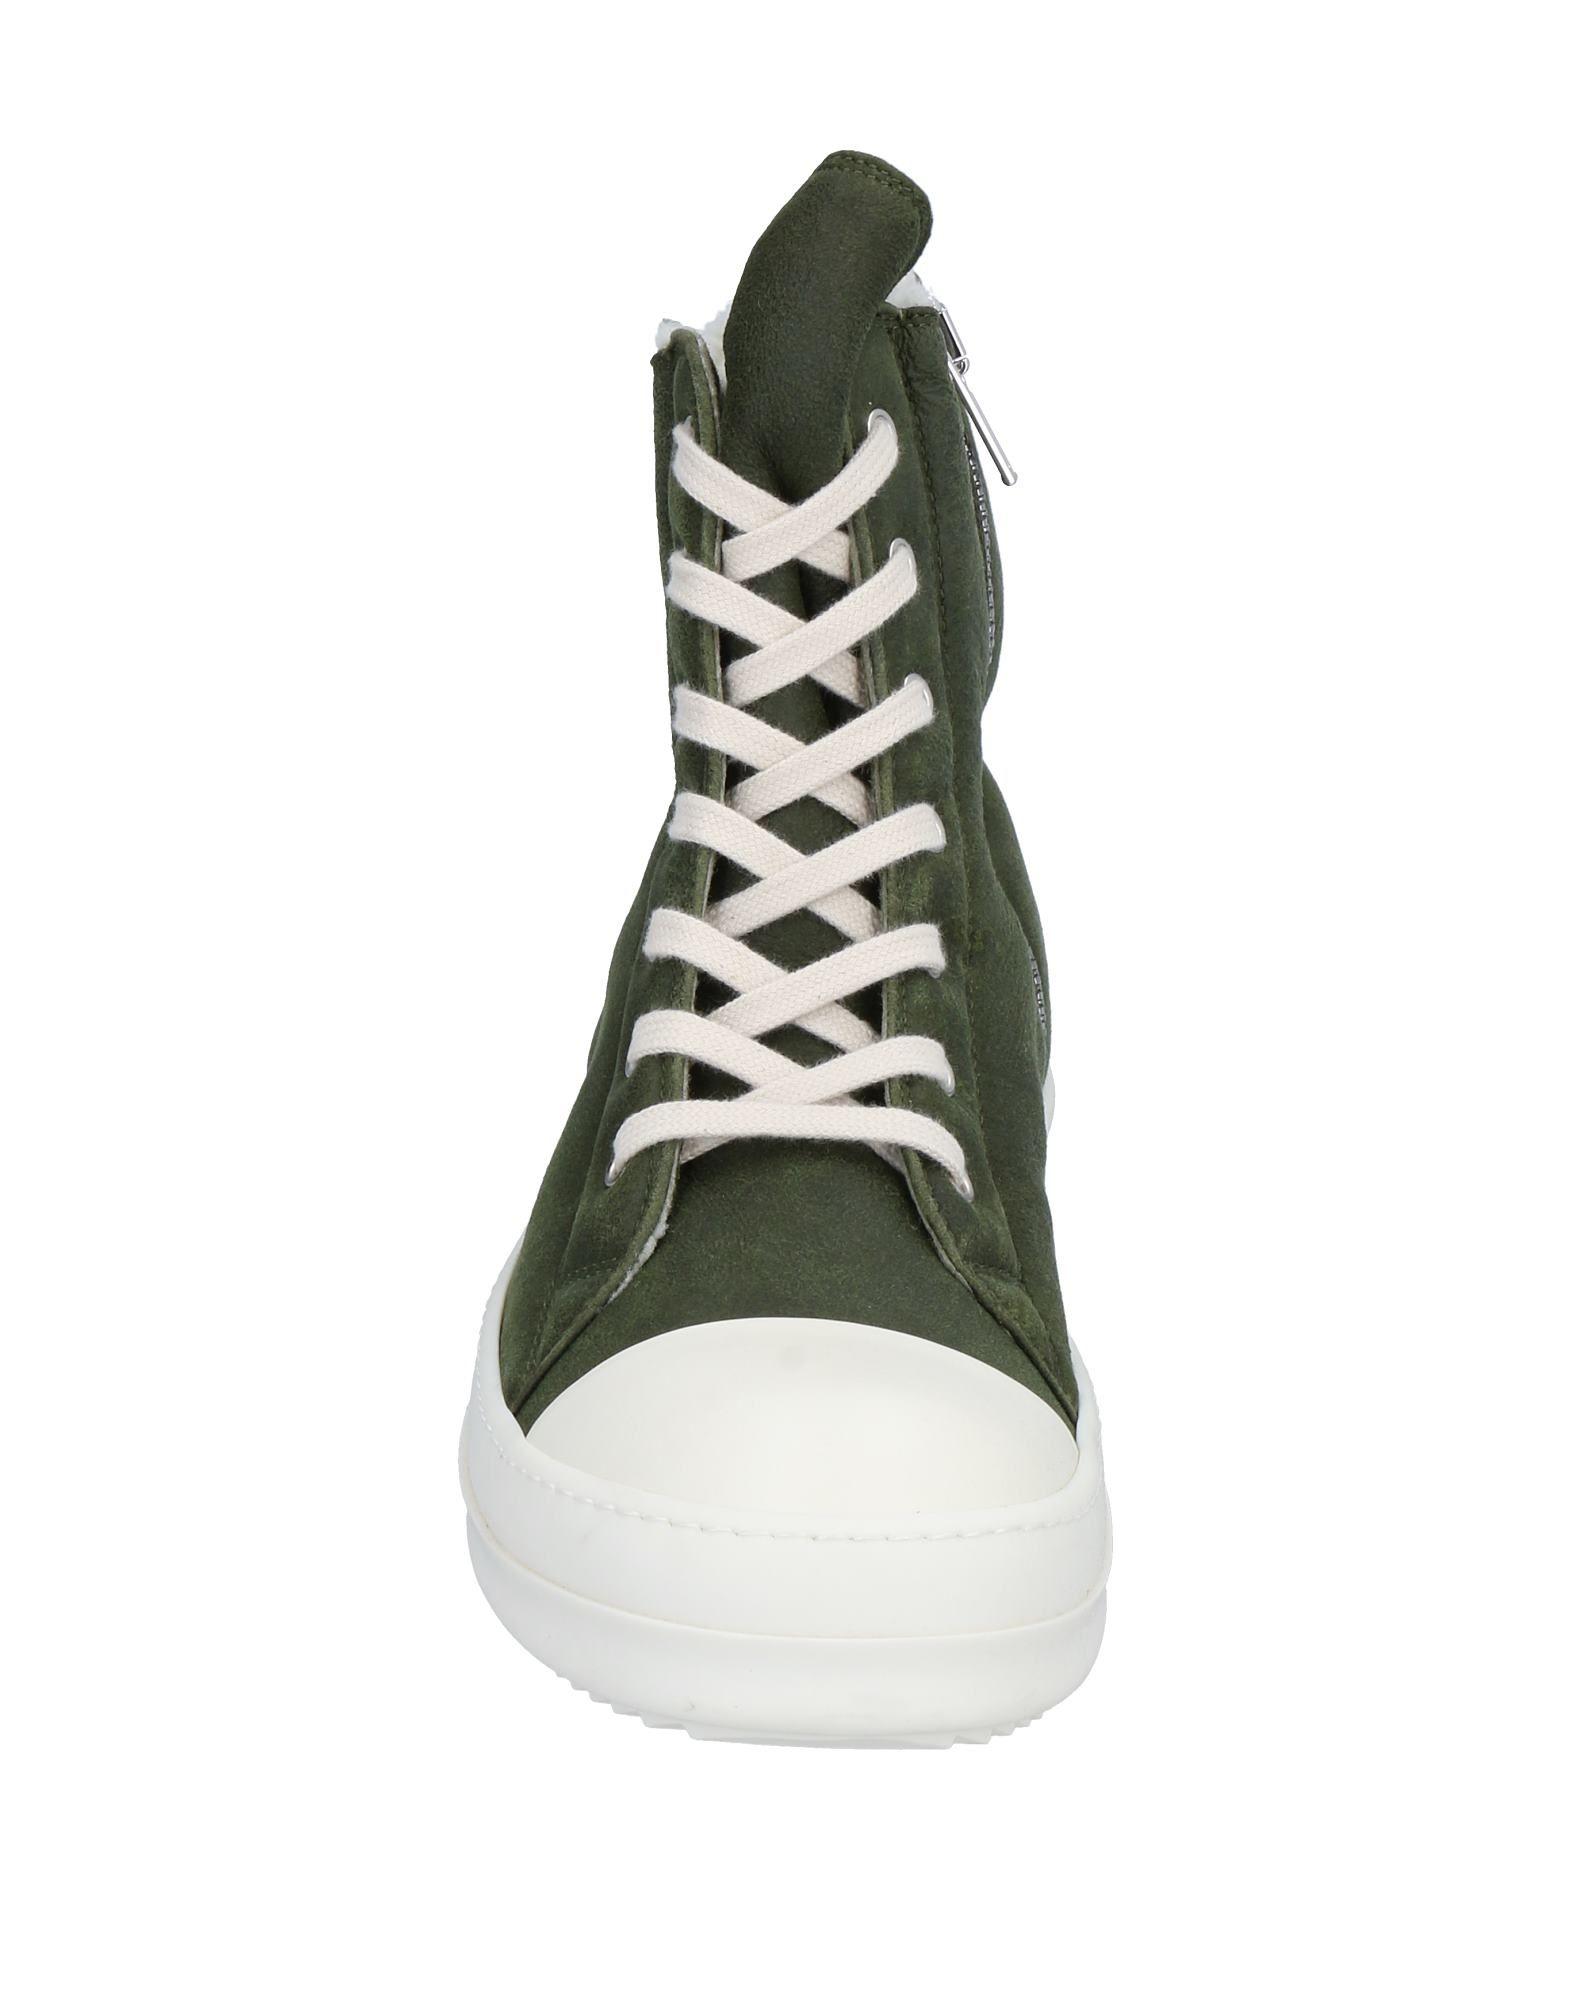 Rick Owens Sneakers Herren  11517955IT Gute Qualität beliebte Schuhe